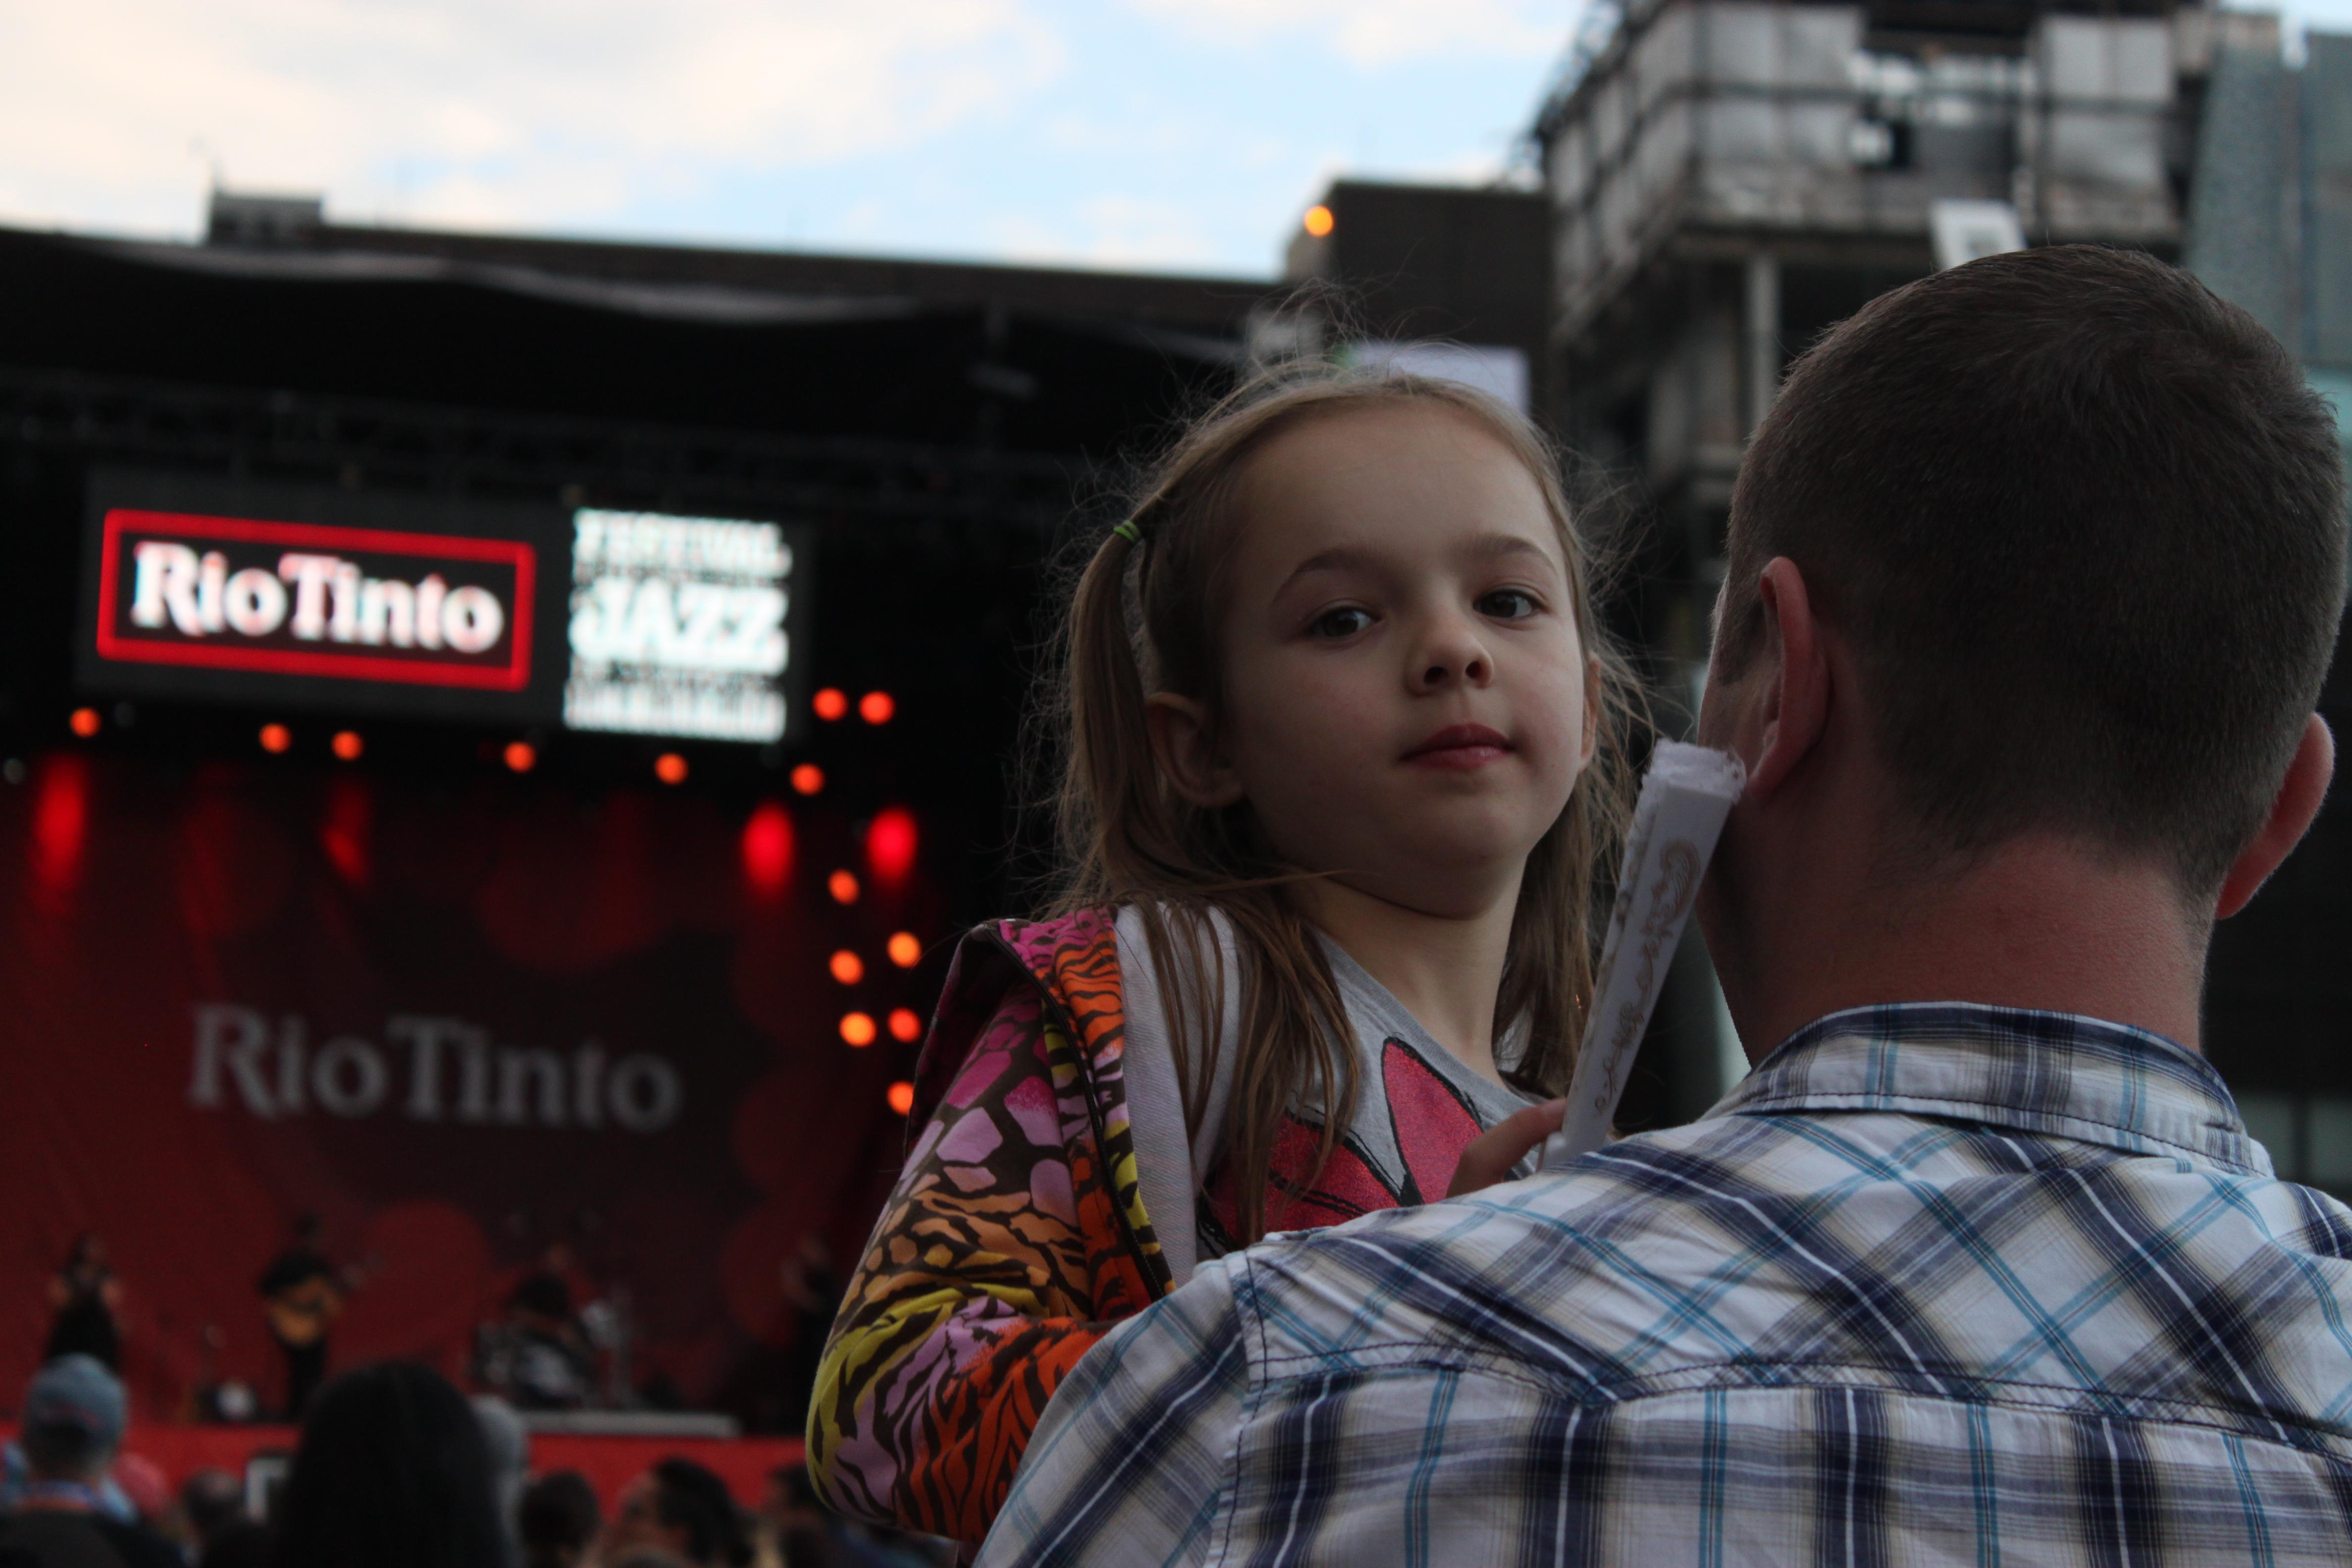 The festival is a decidedly family-friendly affair